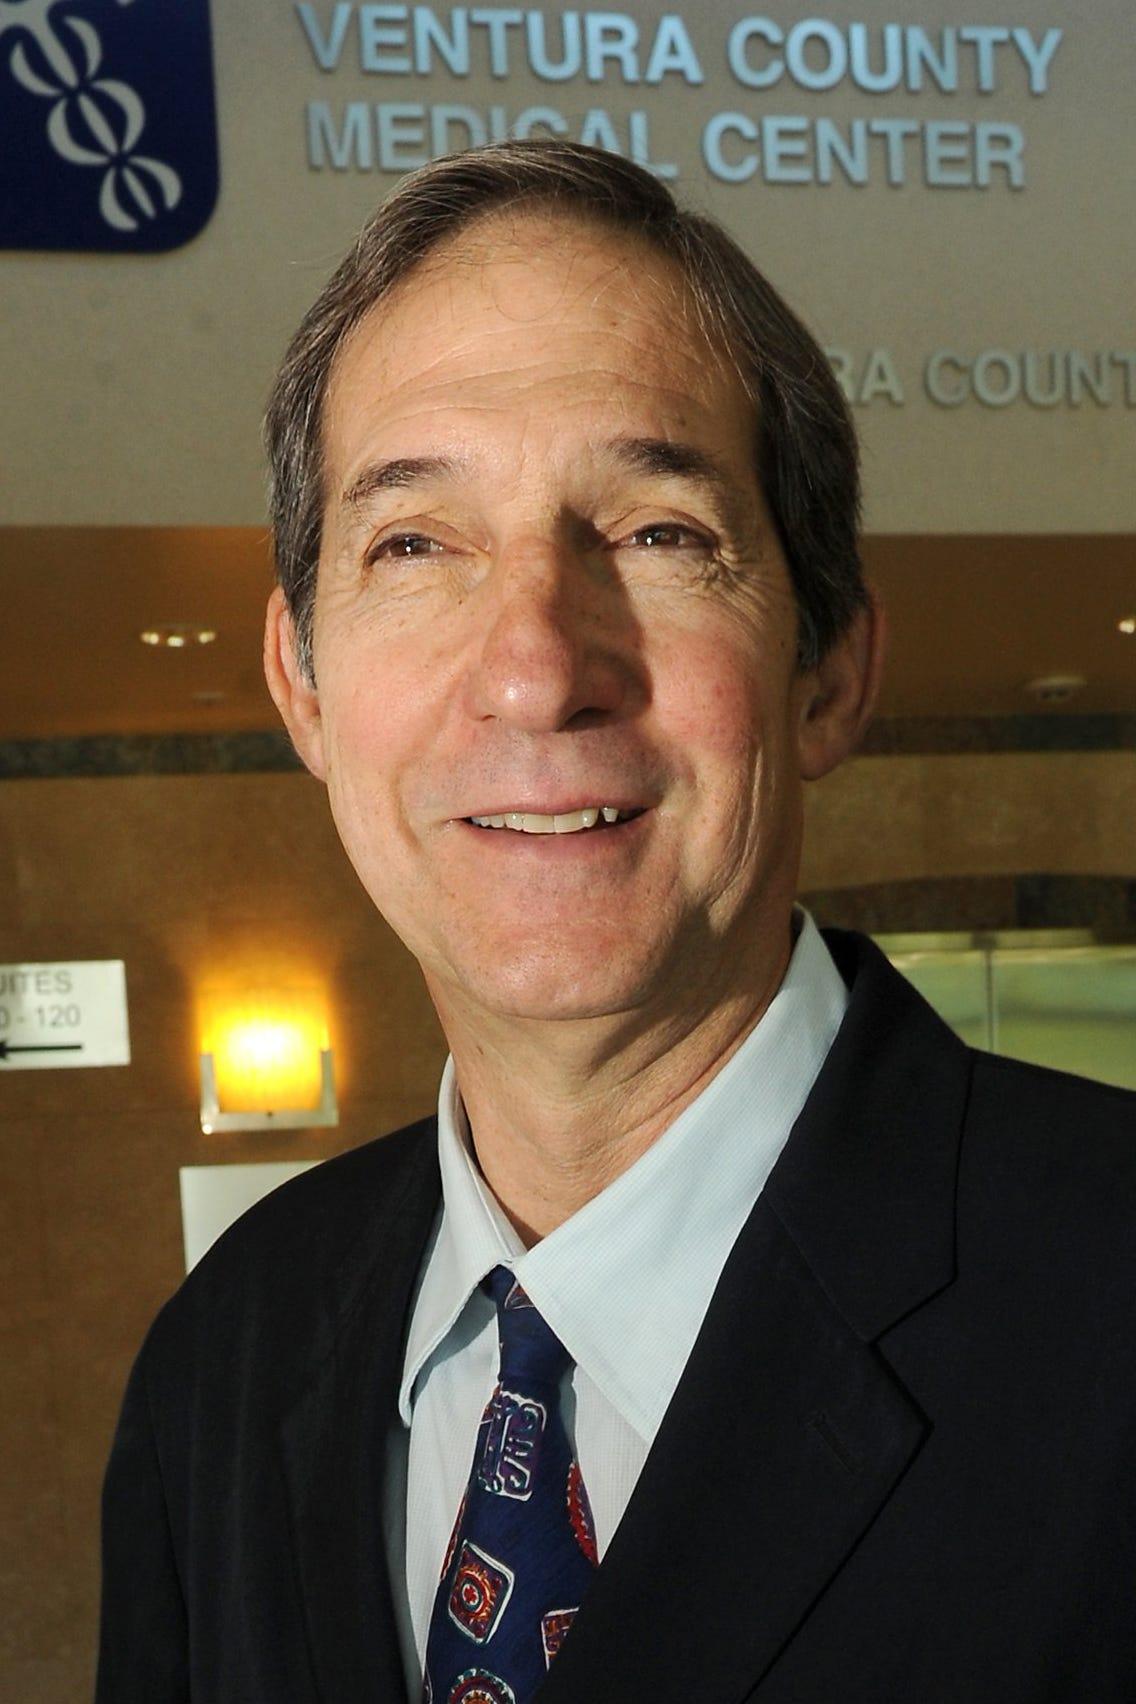 Dr. Robert Levin serves as Ventura's County health officer.